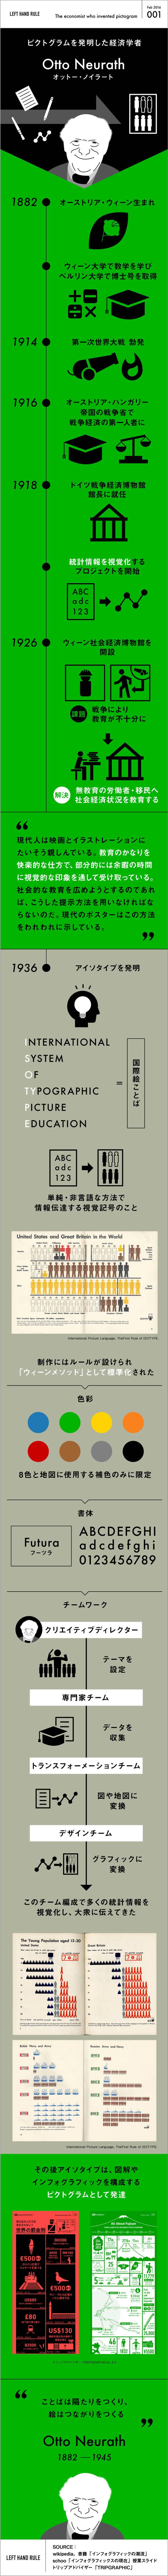 Yuzuaji infographic 201602 03 01